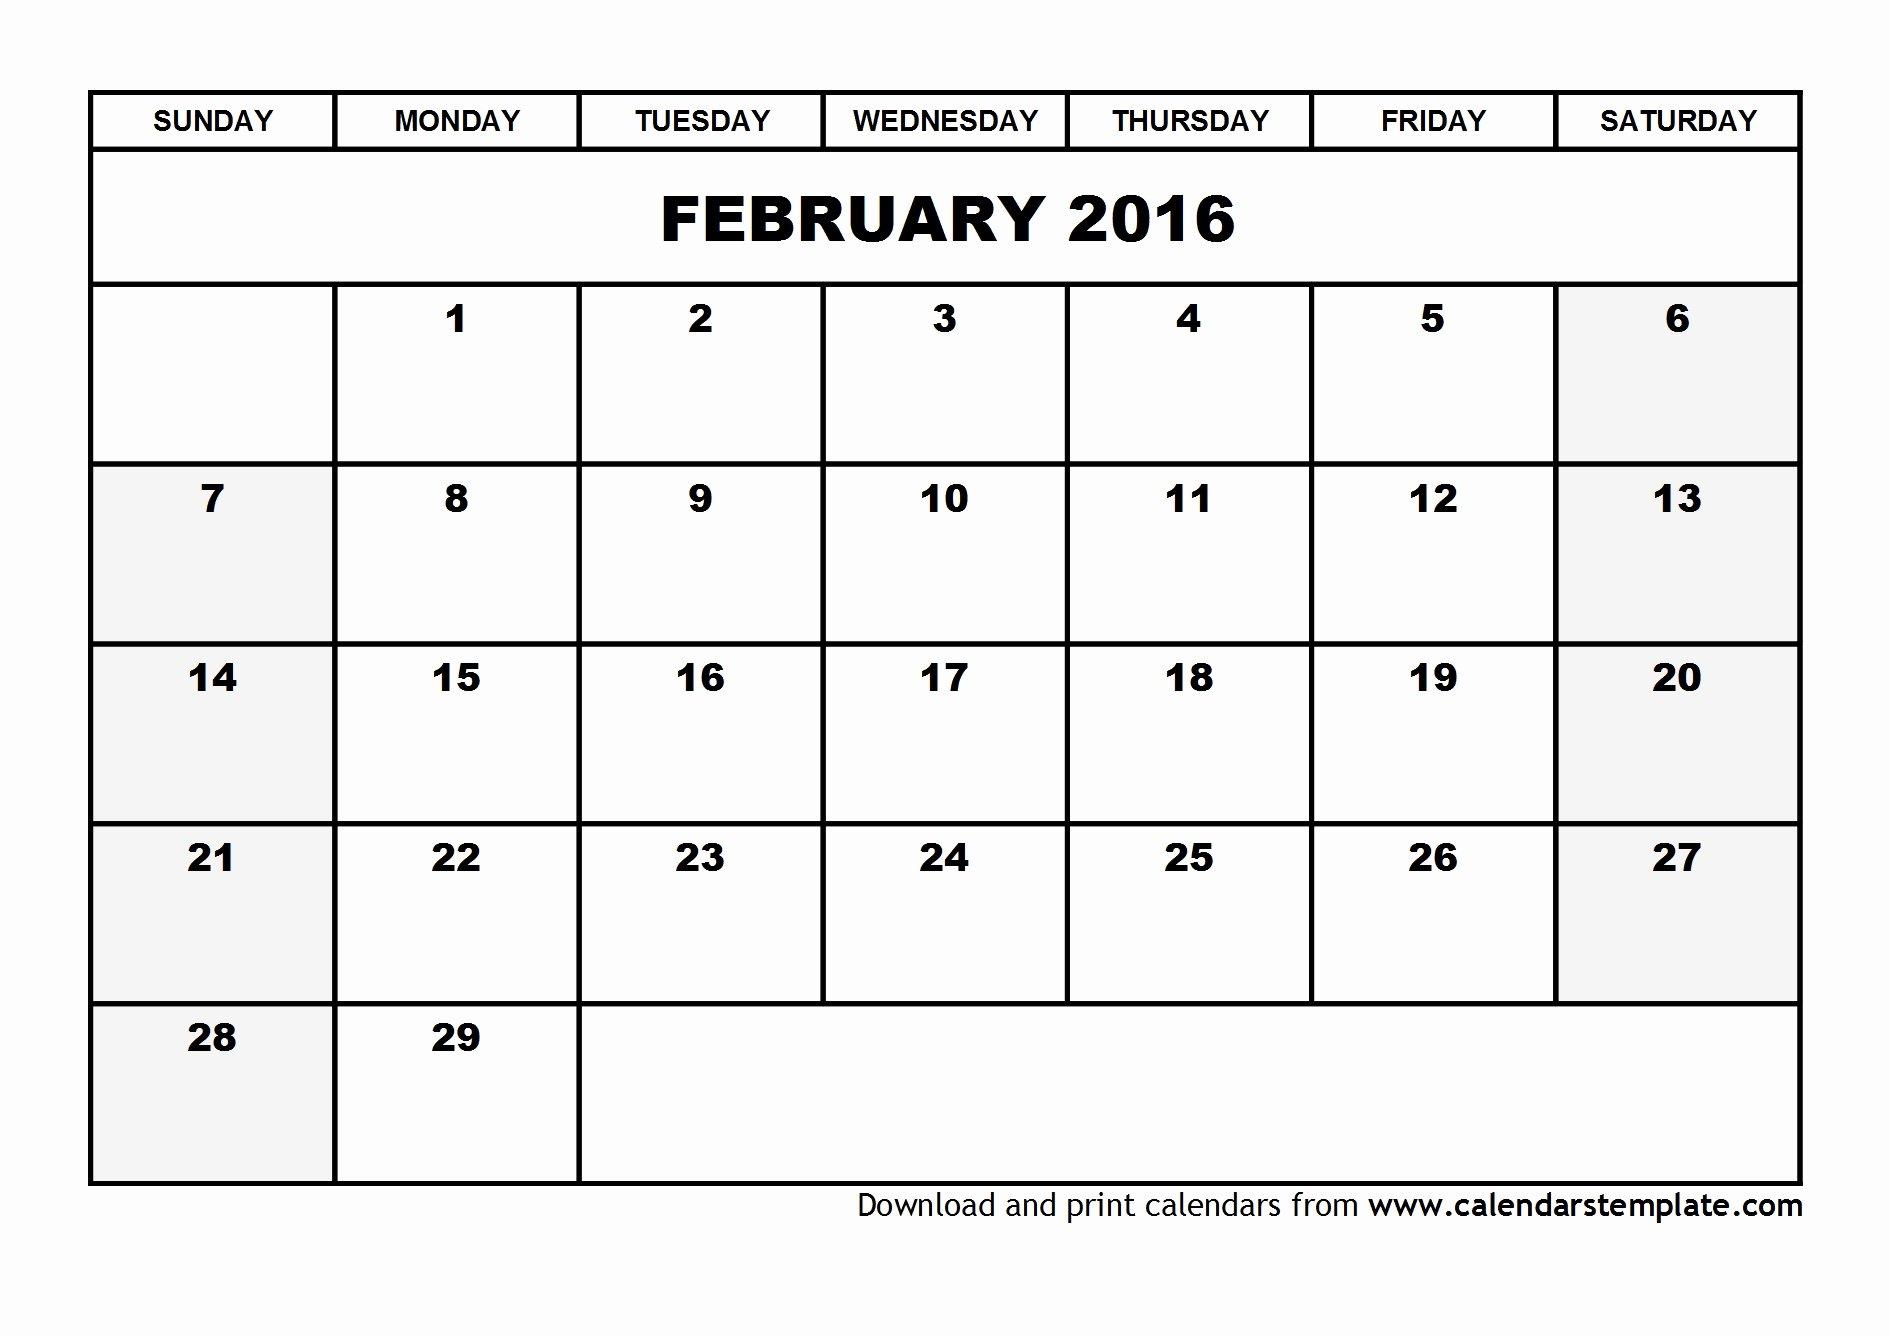 Blank Calendar Template 2016 Awesome February 2016 Calendar Template